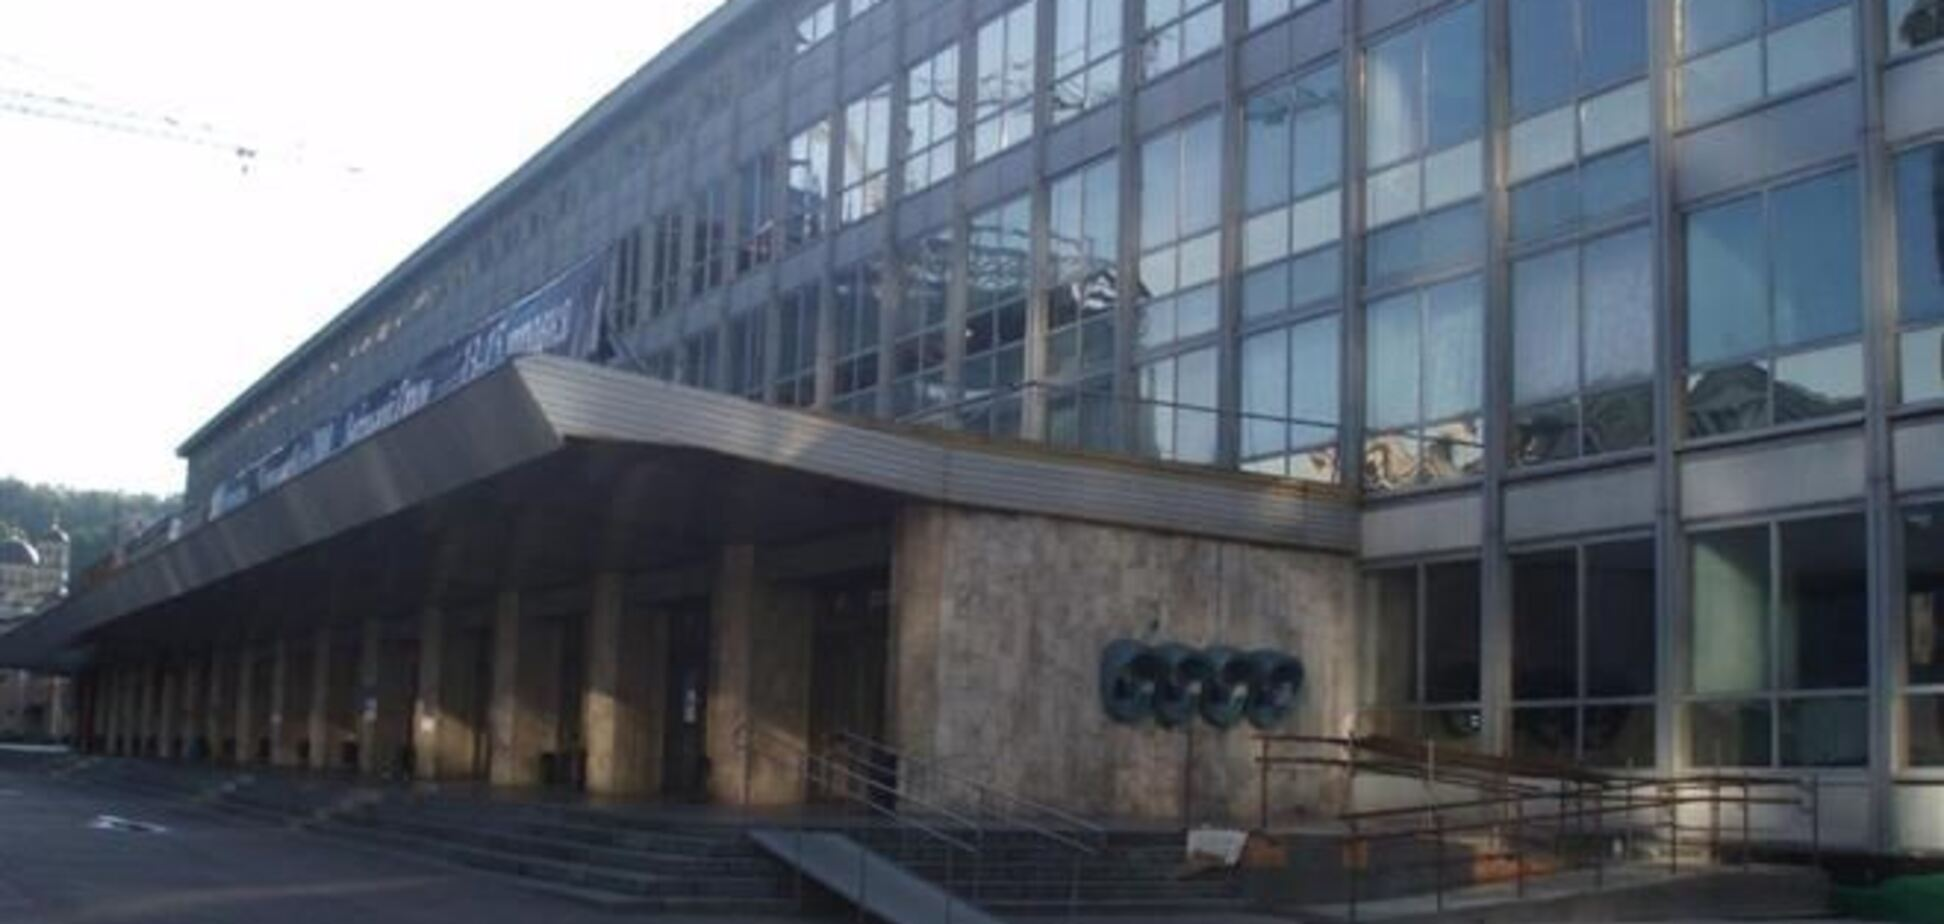 Работники Дворца спорта пожаловались Яценюку на беспредел Булатова